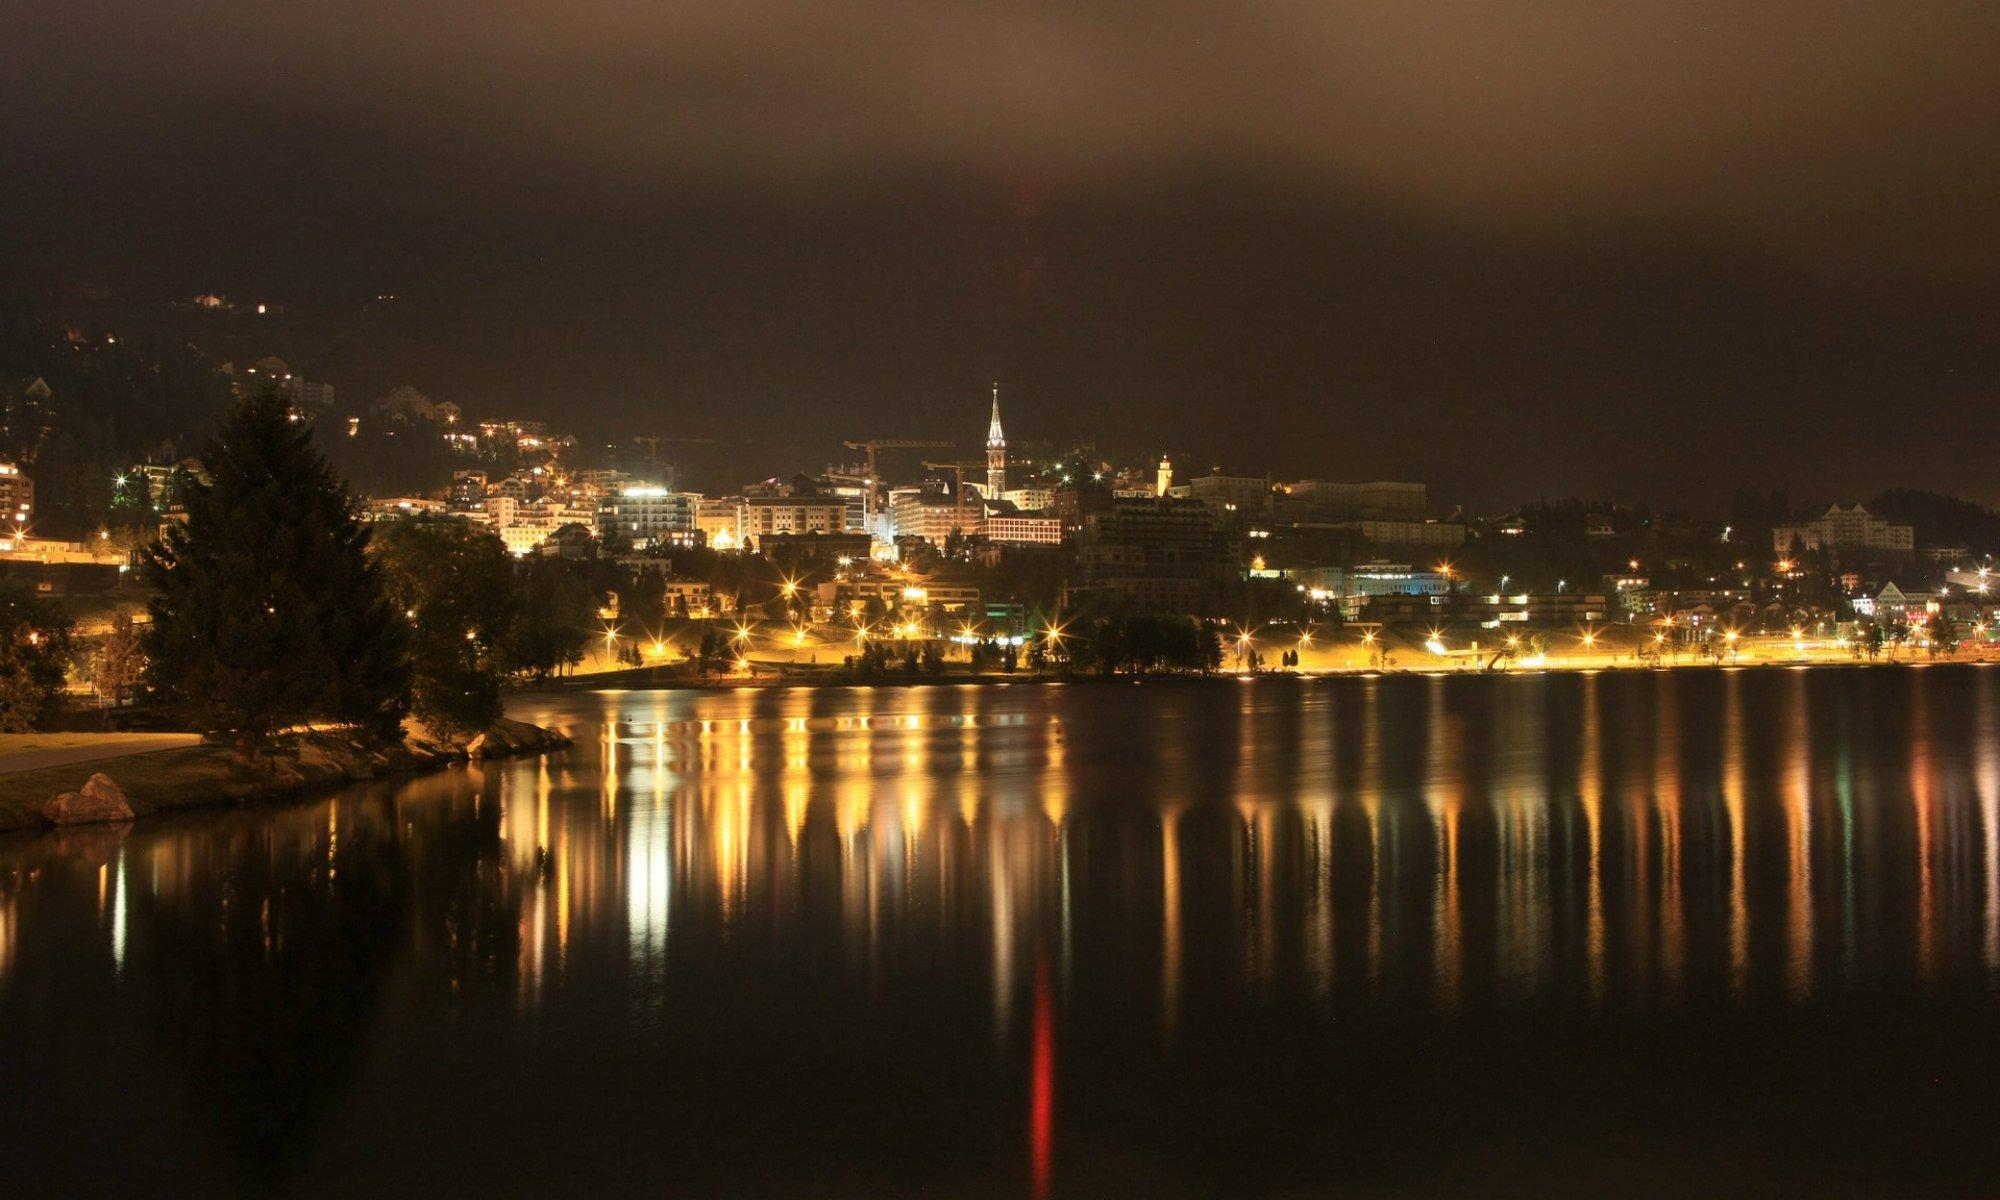 St. Moritz di notte.